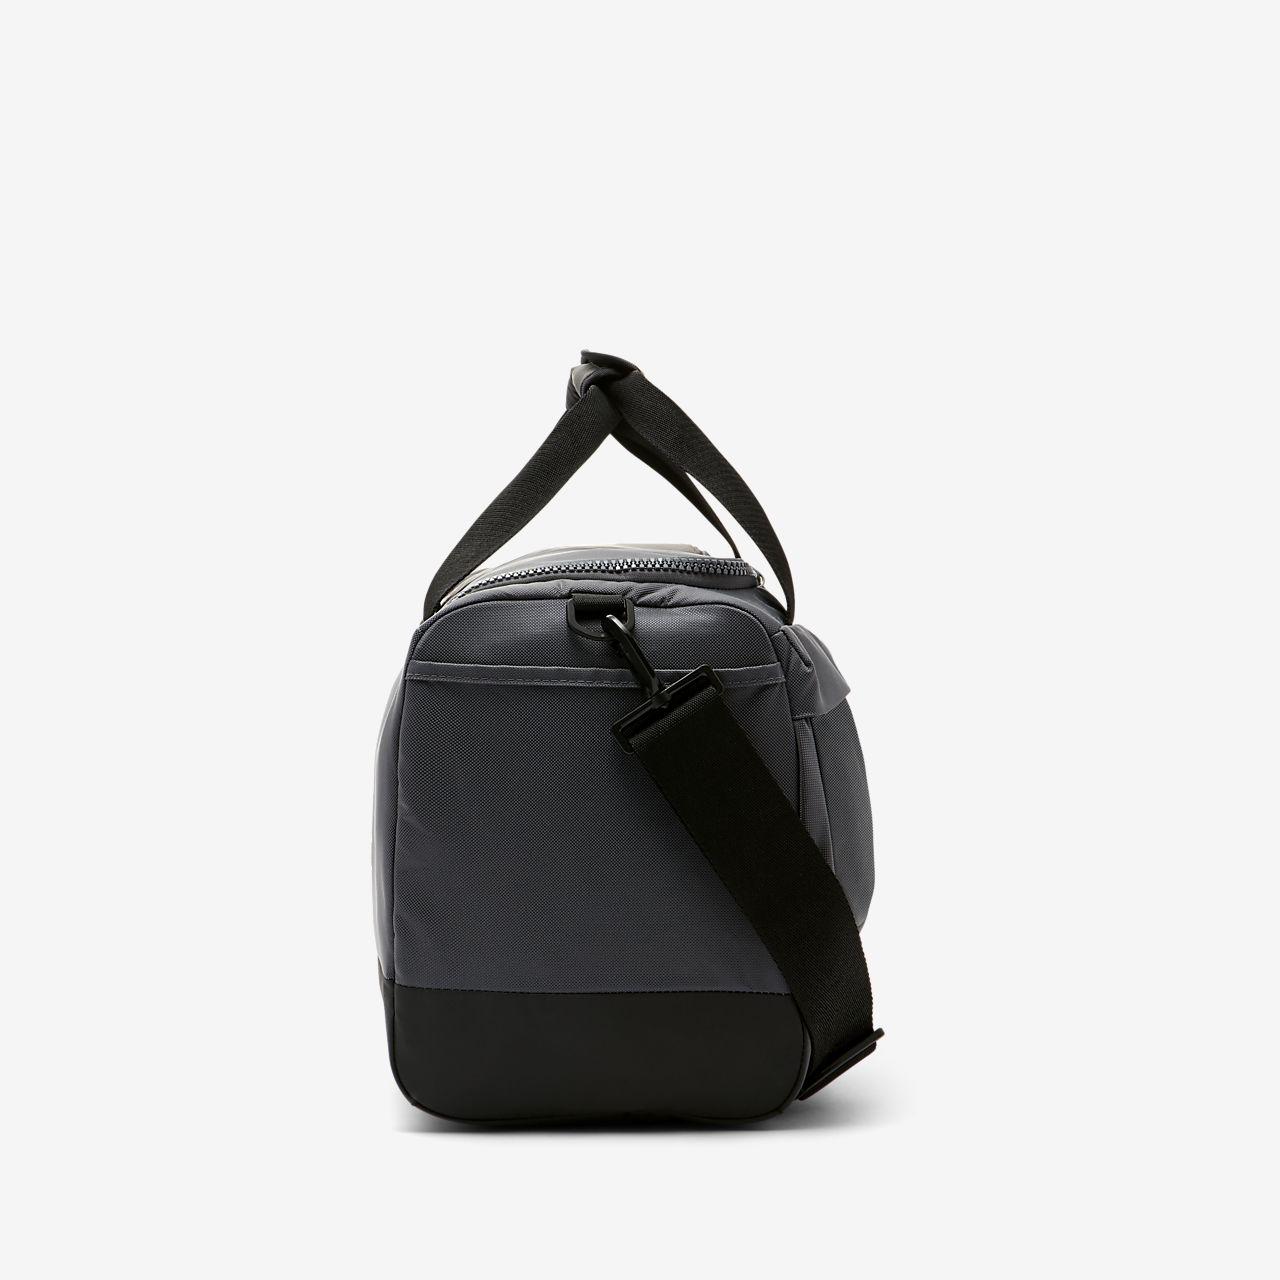 7a3c52df58799 Nike Vapor Power Men s Training Duffel Bag (Small). Nike.com DK